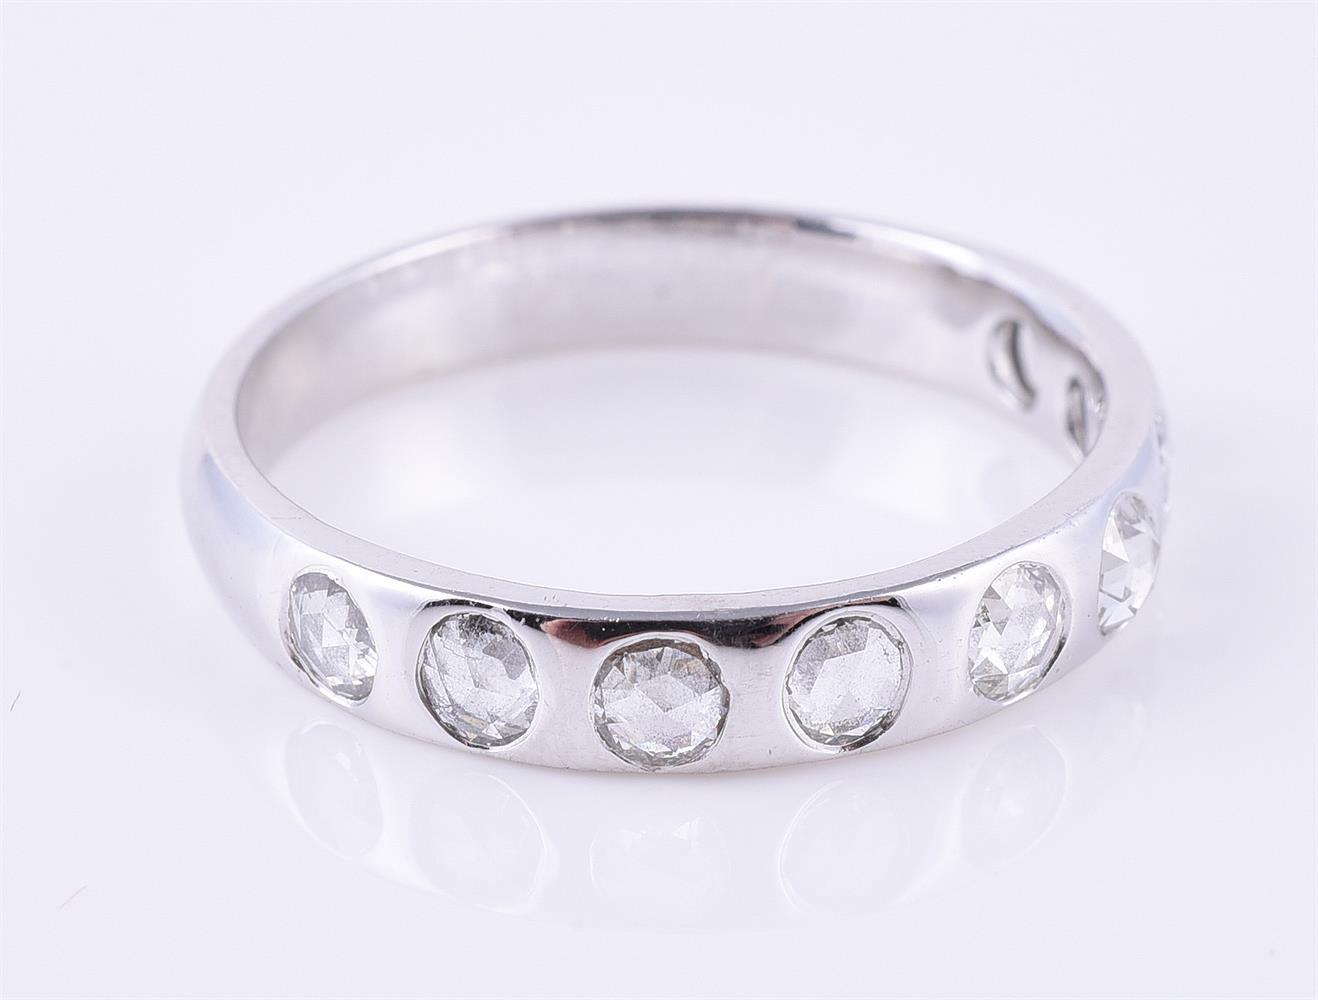 A rose cut diamond band ring